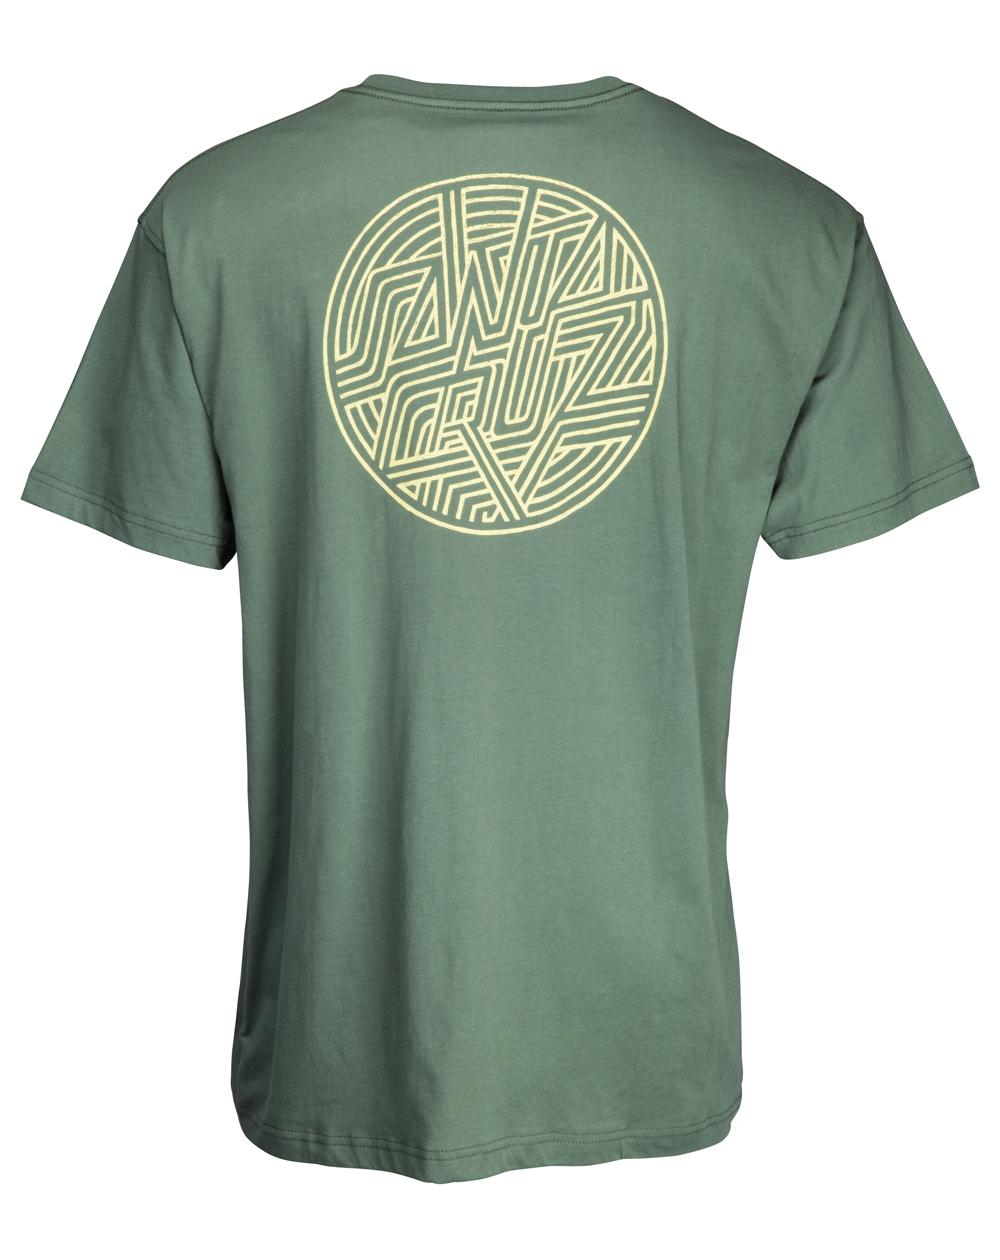 Santa Cruz Herren T-Shirt Dimension Dot Sage